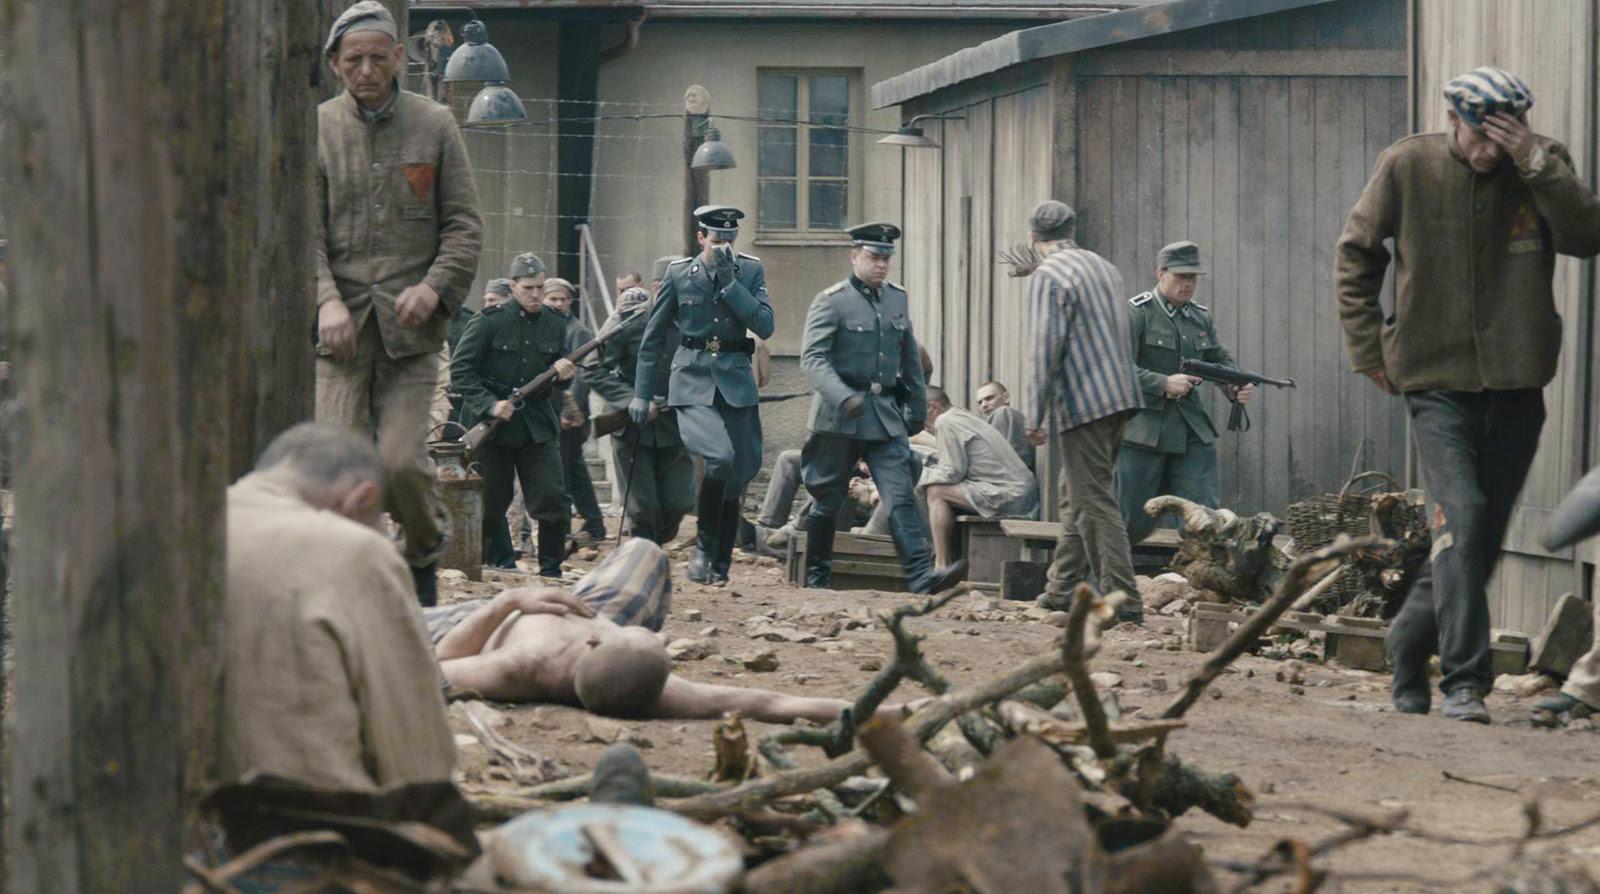 6 - Mémorial de Buchenwald